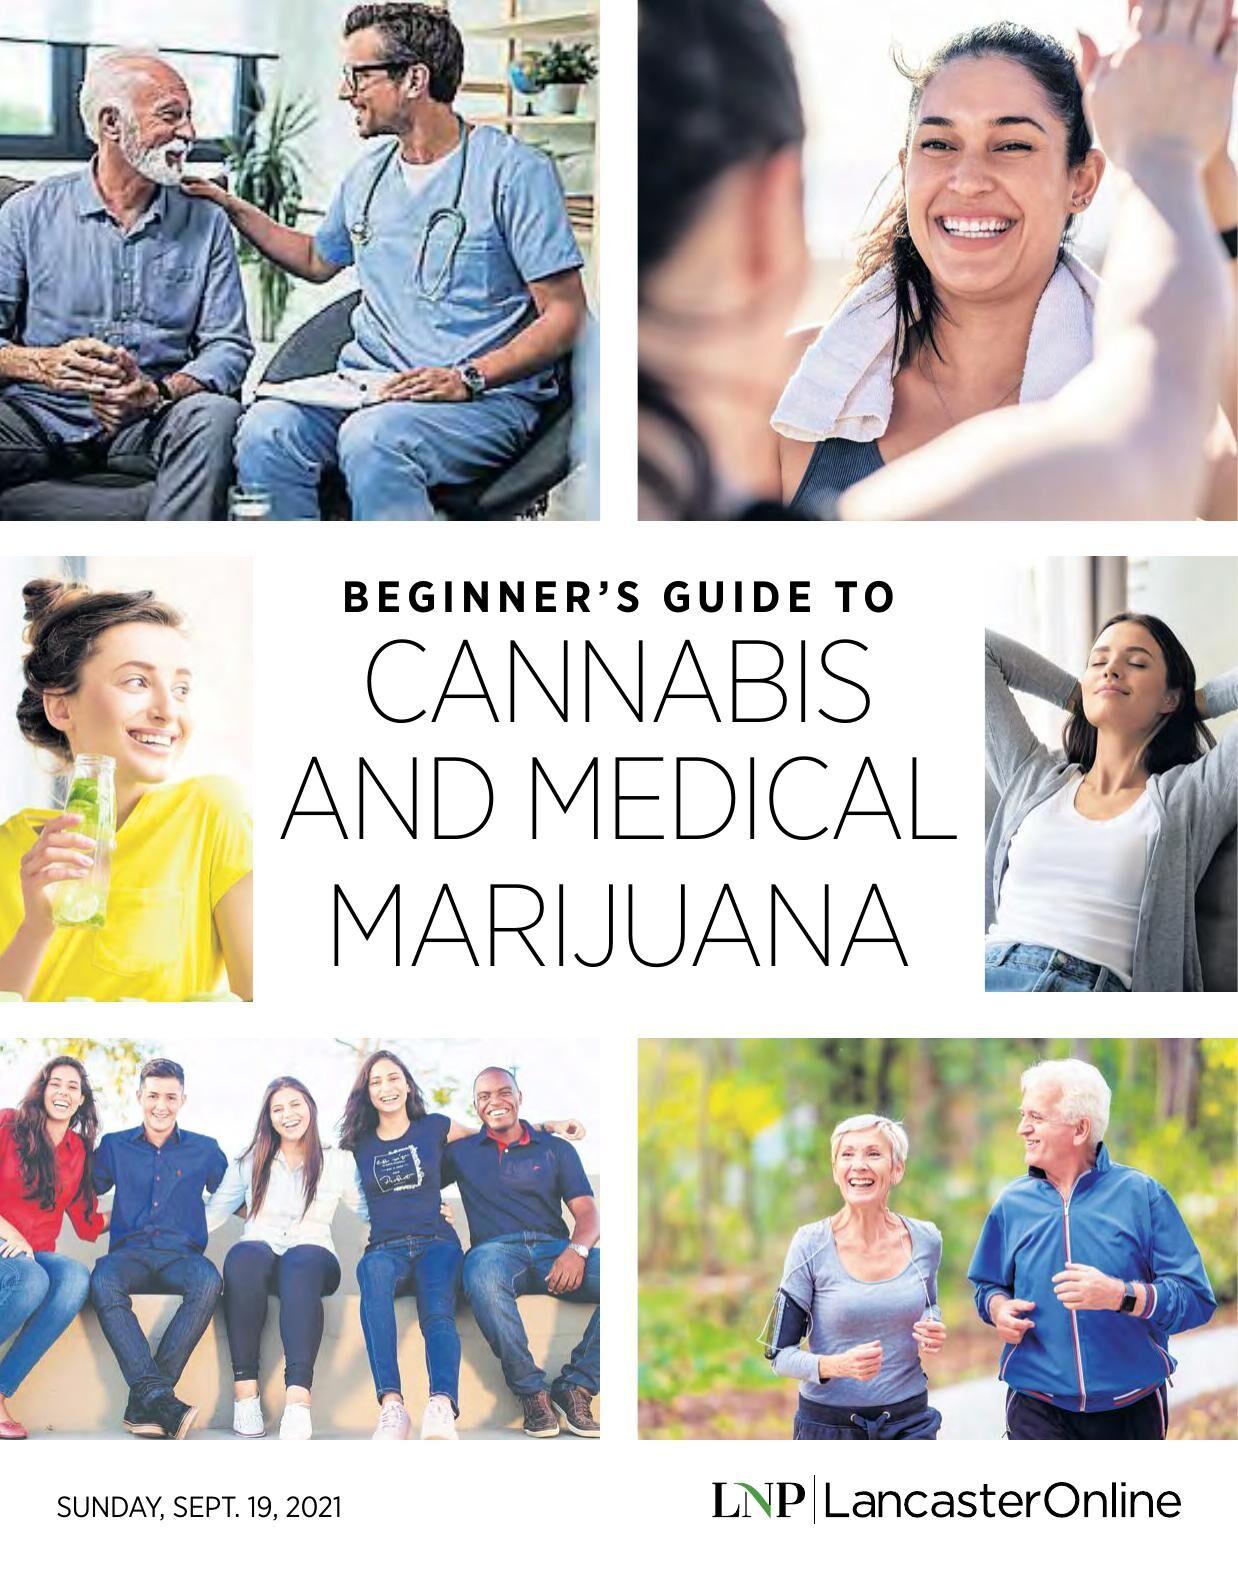 Beginner's Guide To Cannabis And Medical Marijuana